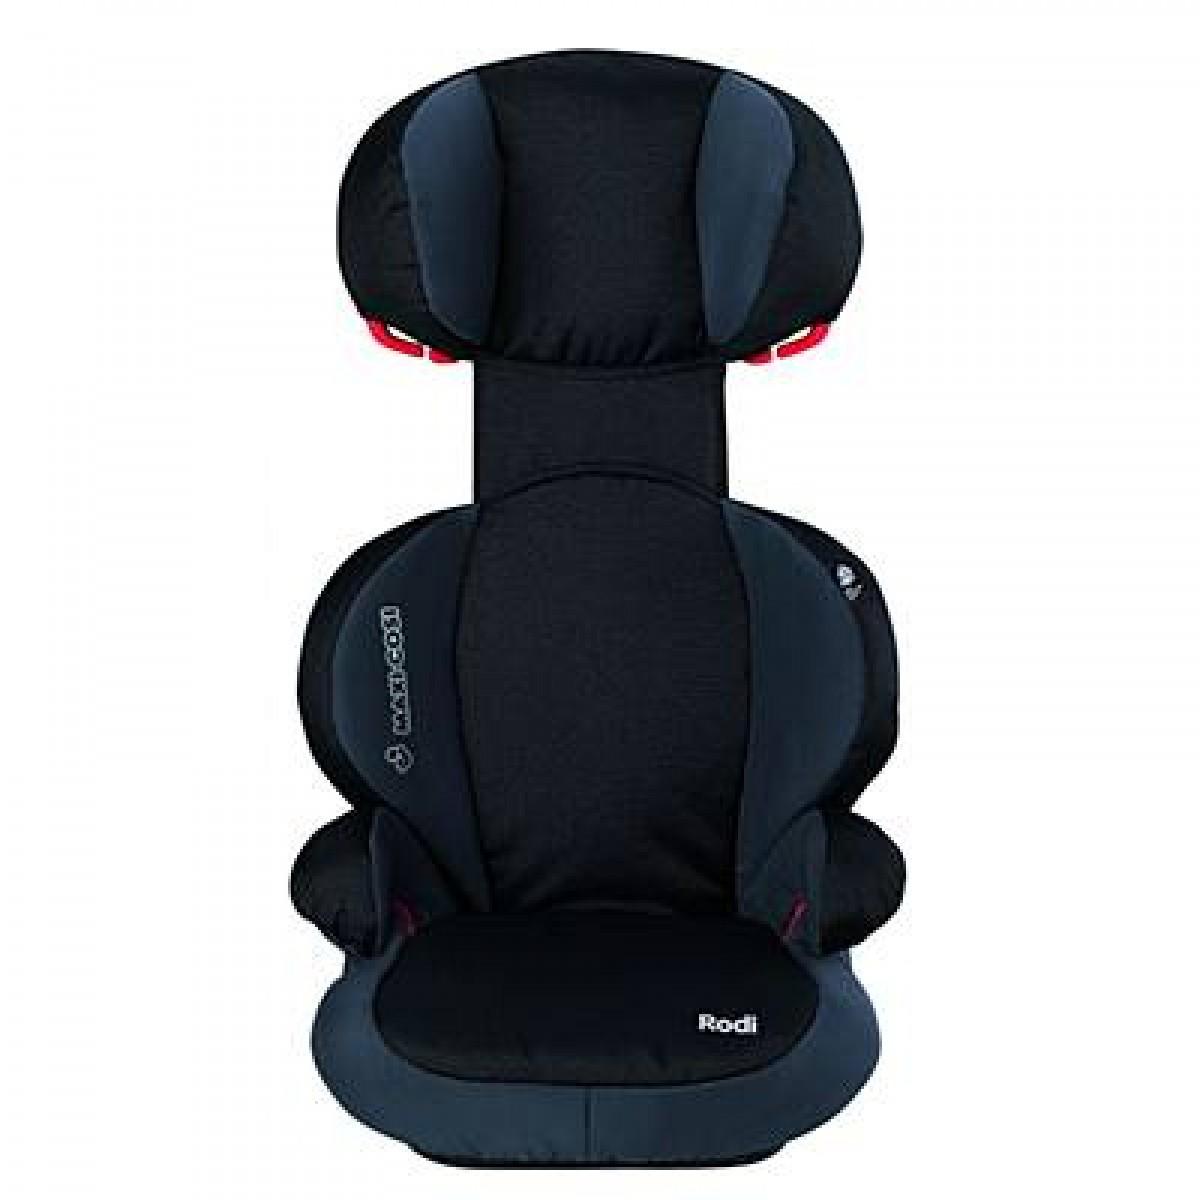 maxi cosi rodi sps car seat compare. Black Bedroom Furniture Sets. Home Design Ideas